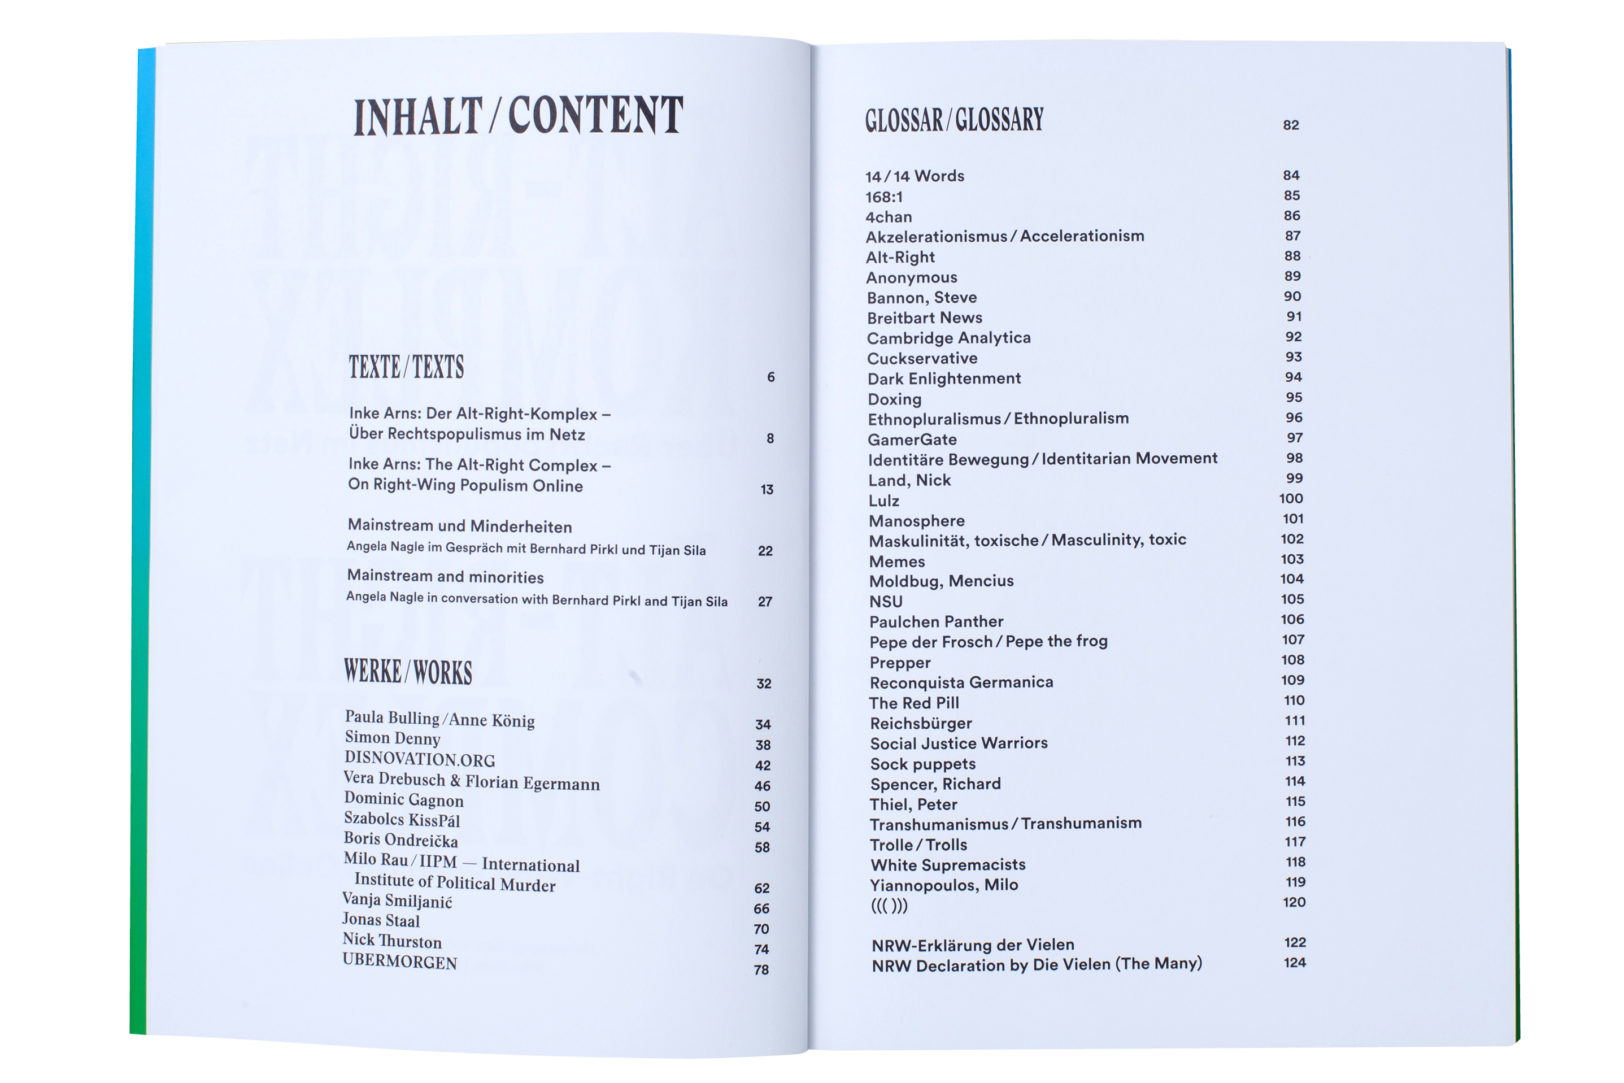 http://e-o-t.de/wordpress/wp-content/uploads/2019/04/eot-books-AltRight-3.jpg